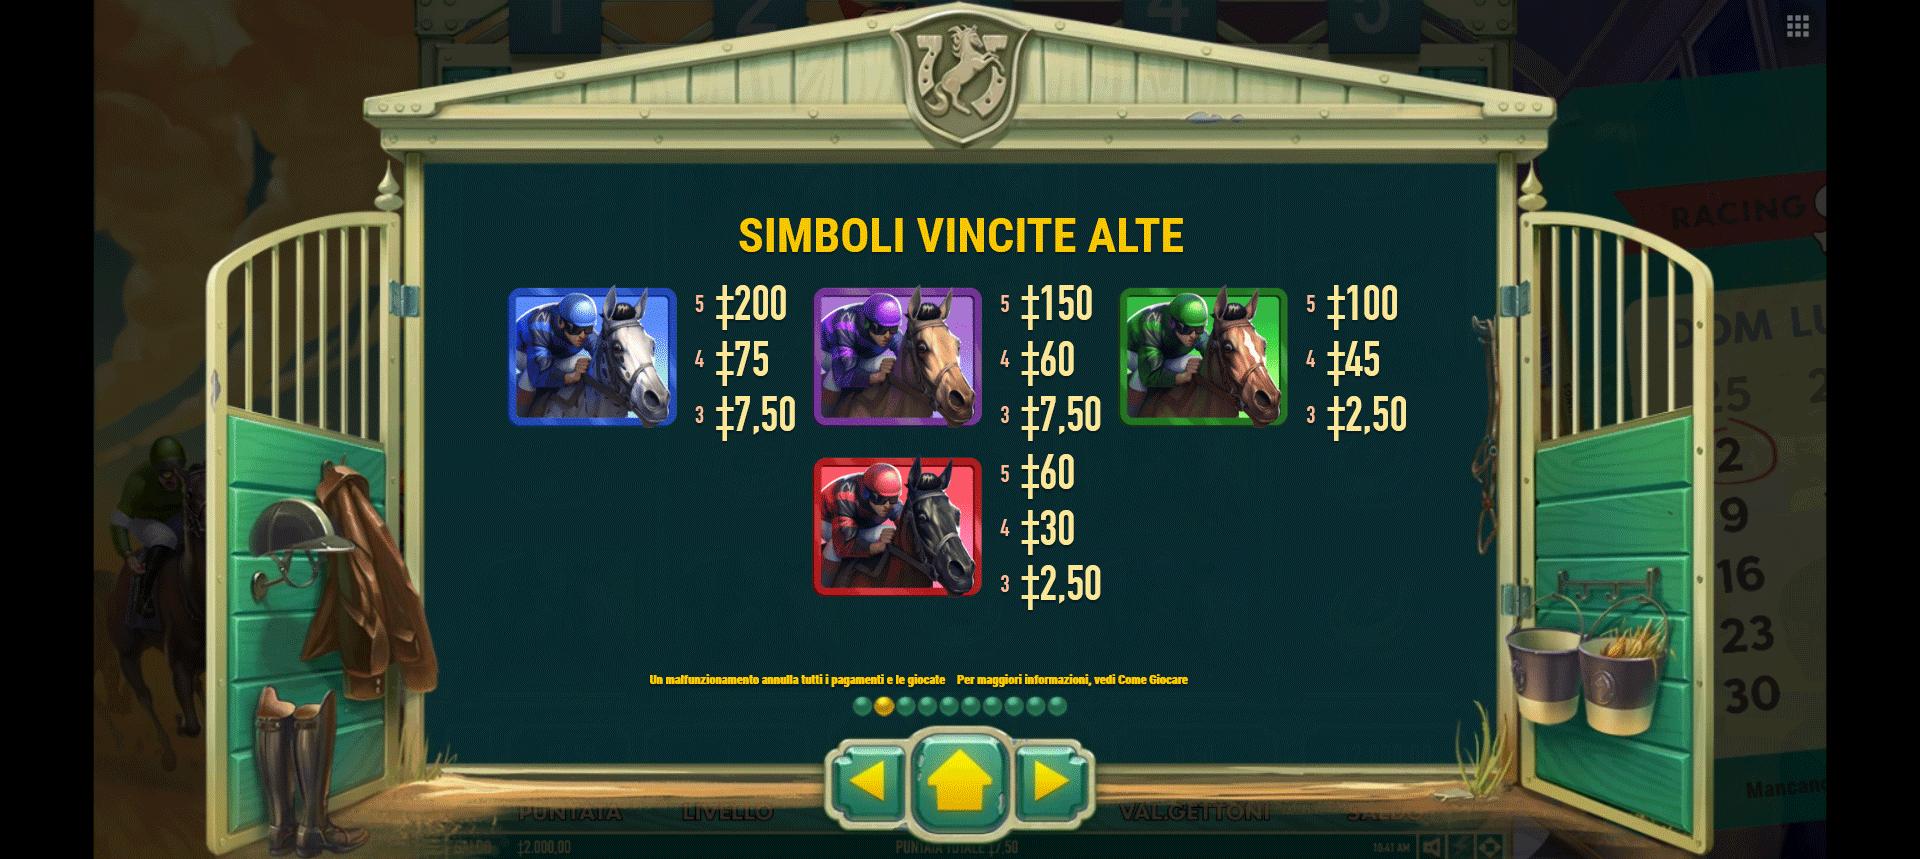 tabella dei simboli della slot machine marvelous furlongs